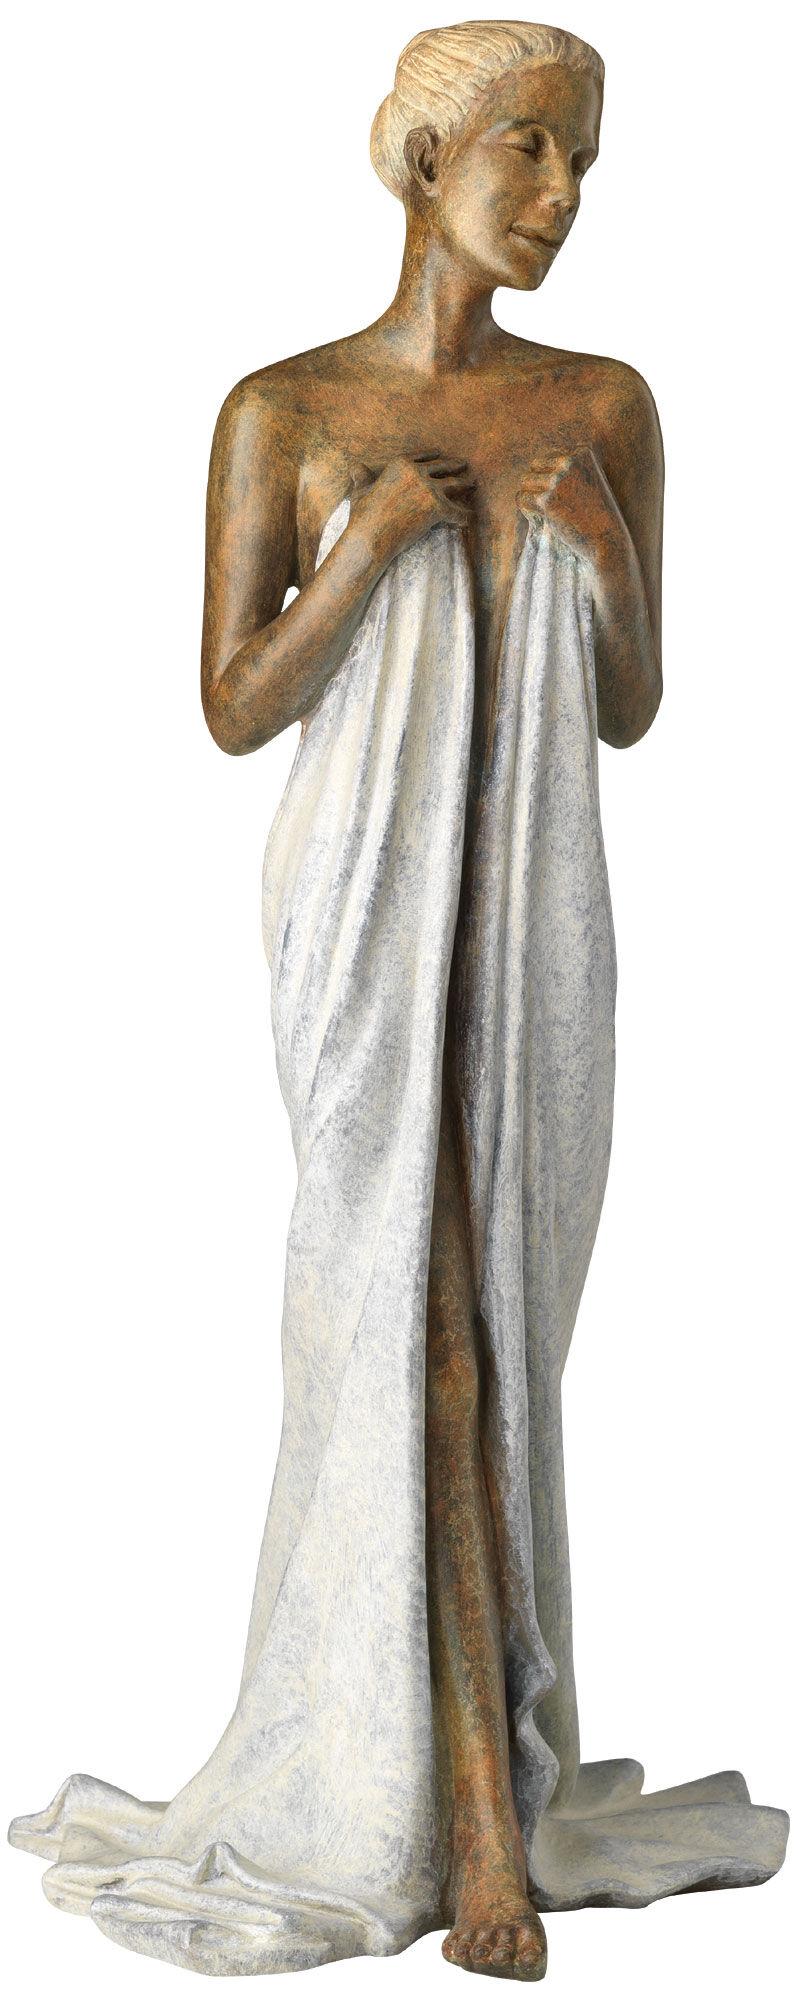 Alain Choisnet Sculpture Quot Lisa Quot Bronze Edition